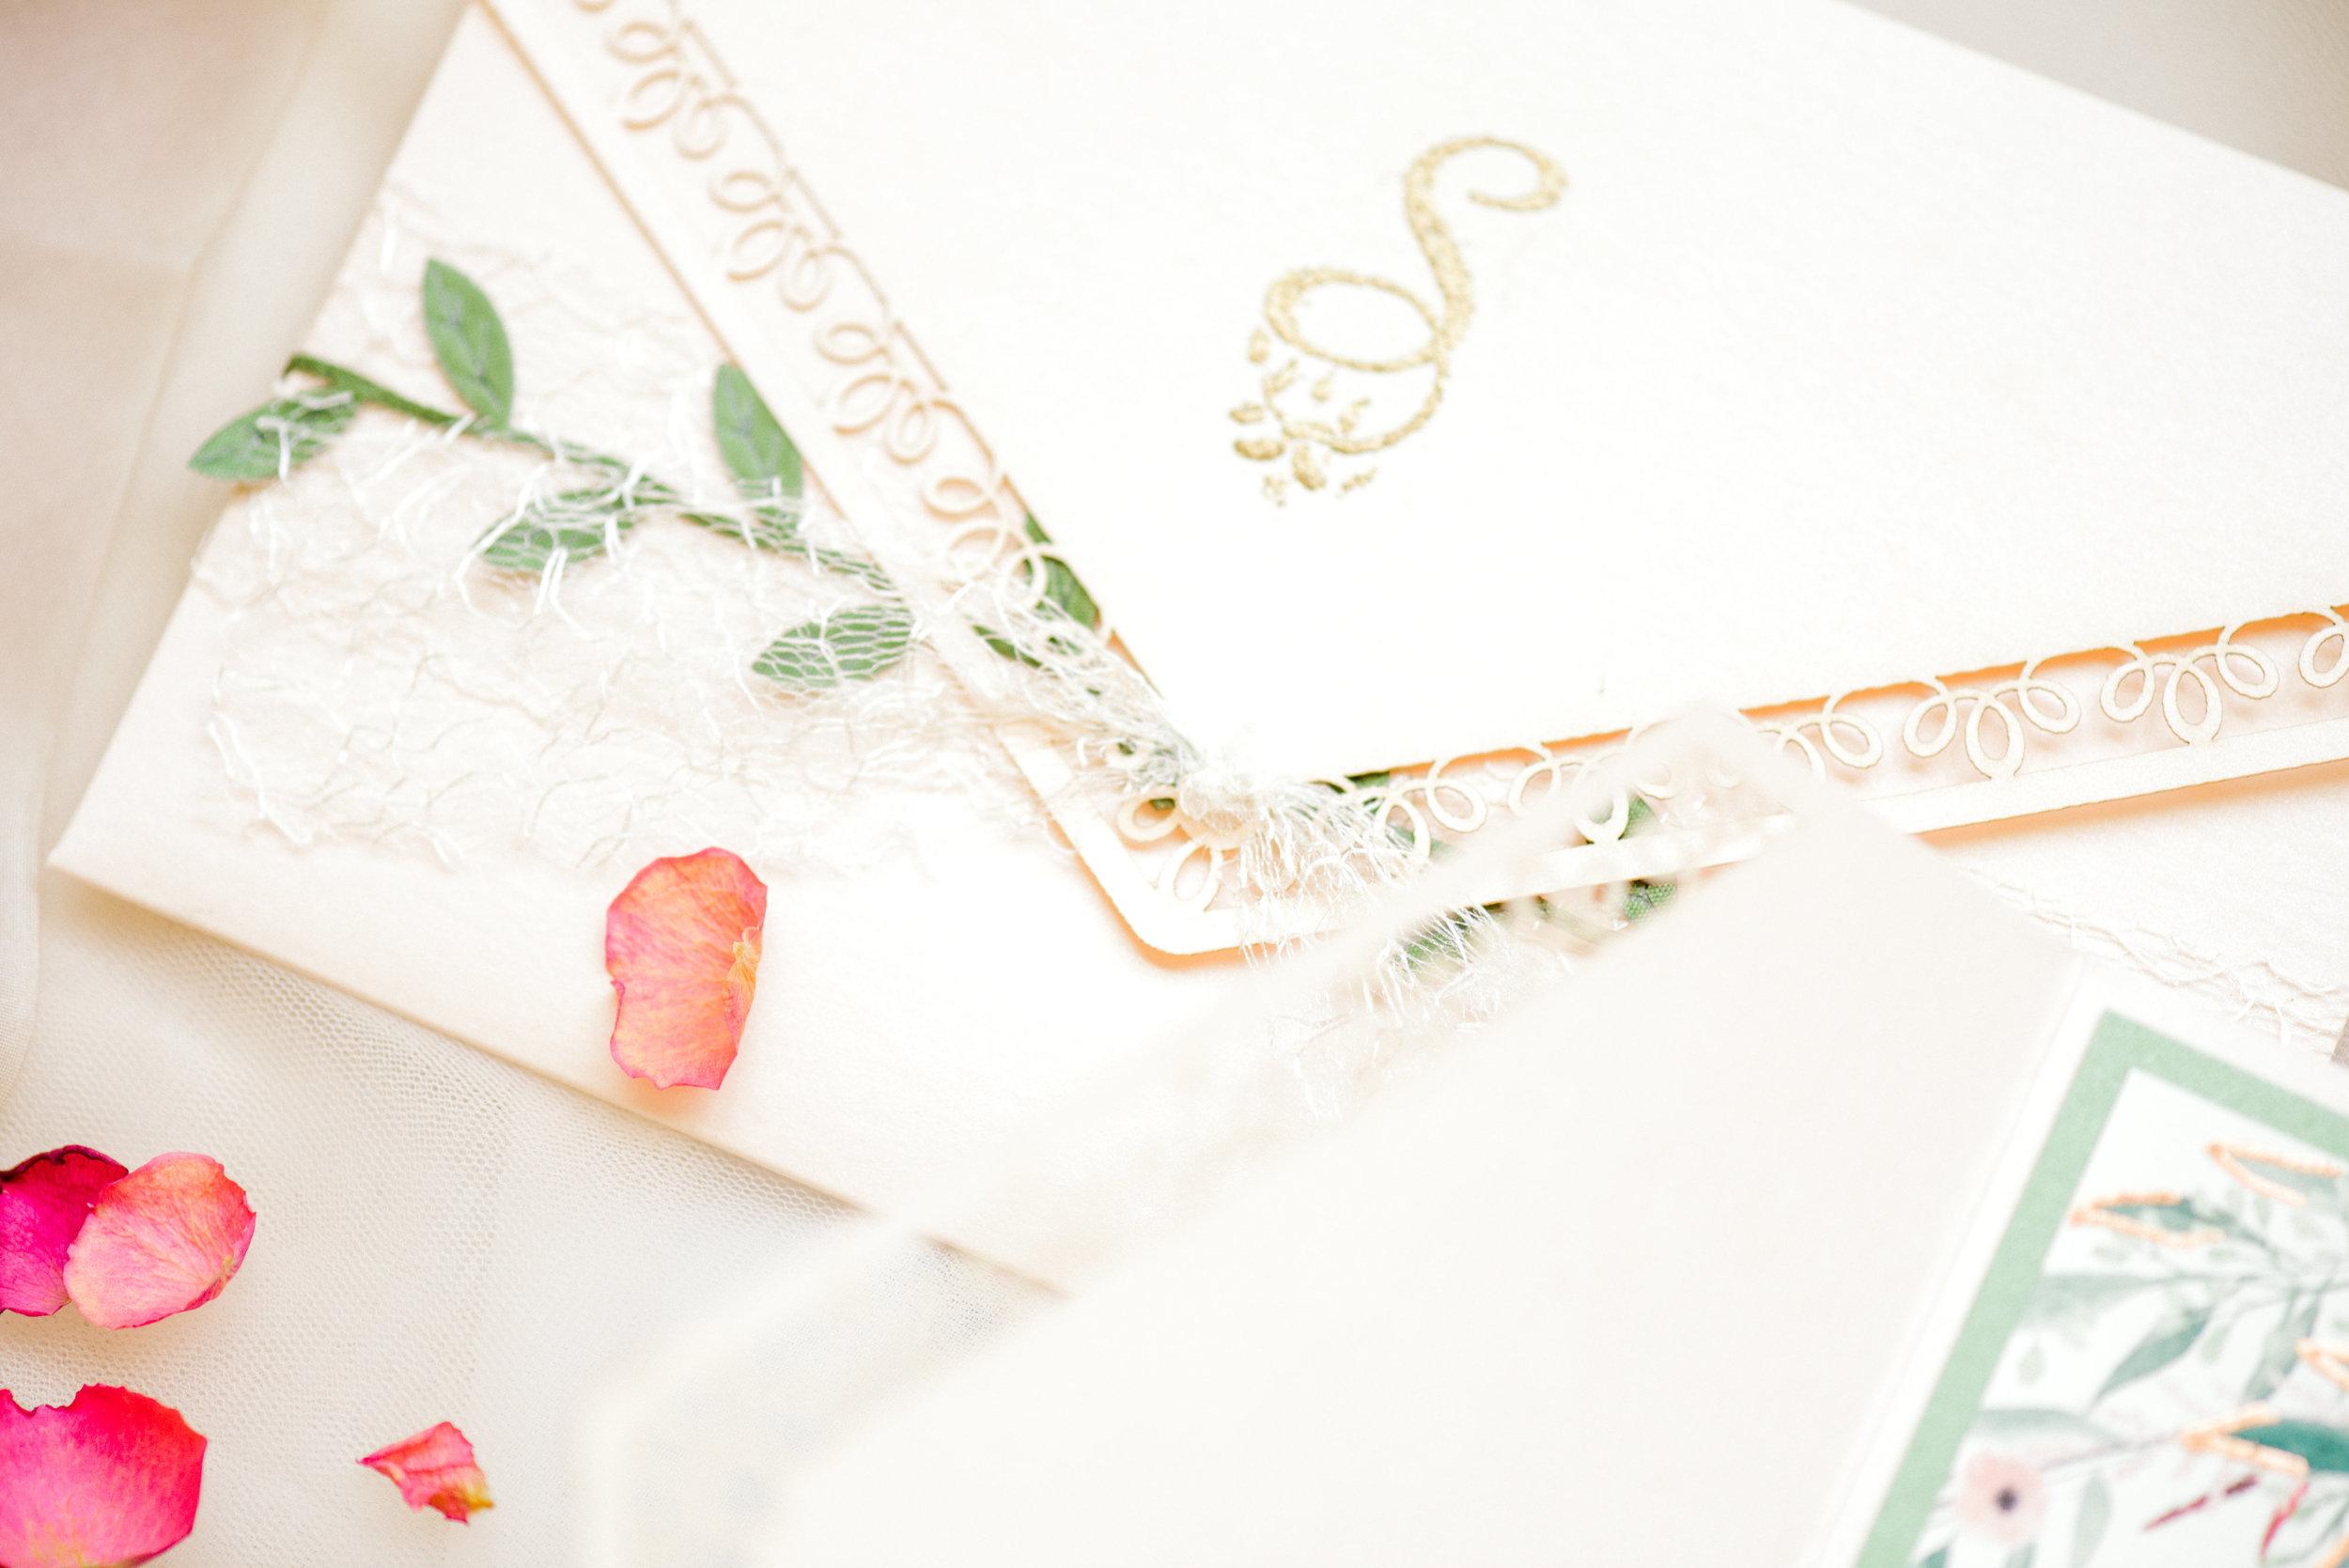 Peach Gold-Central PA, York PA, JesSmith Designs, custom, wedding, invitations, bridal, announcements, save the date, baby, hanover, calligraphy, baltimore, wedding invitations, lancaster, gettysburg66.jpg